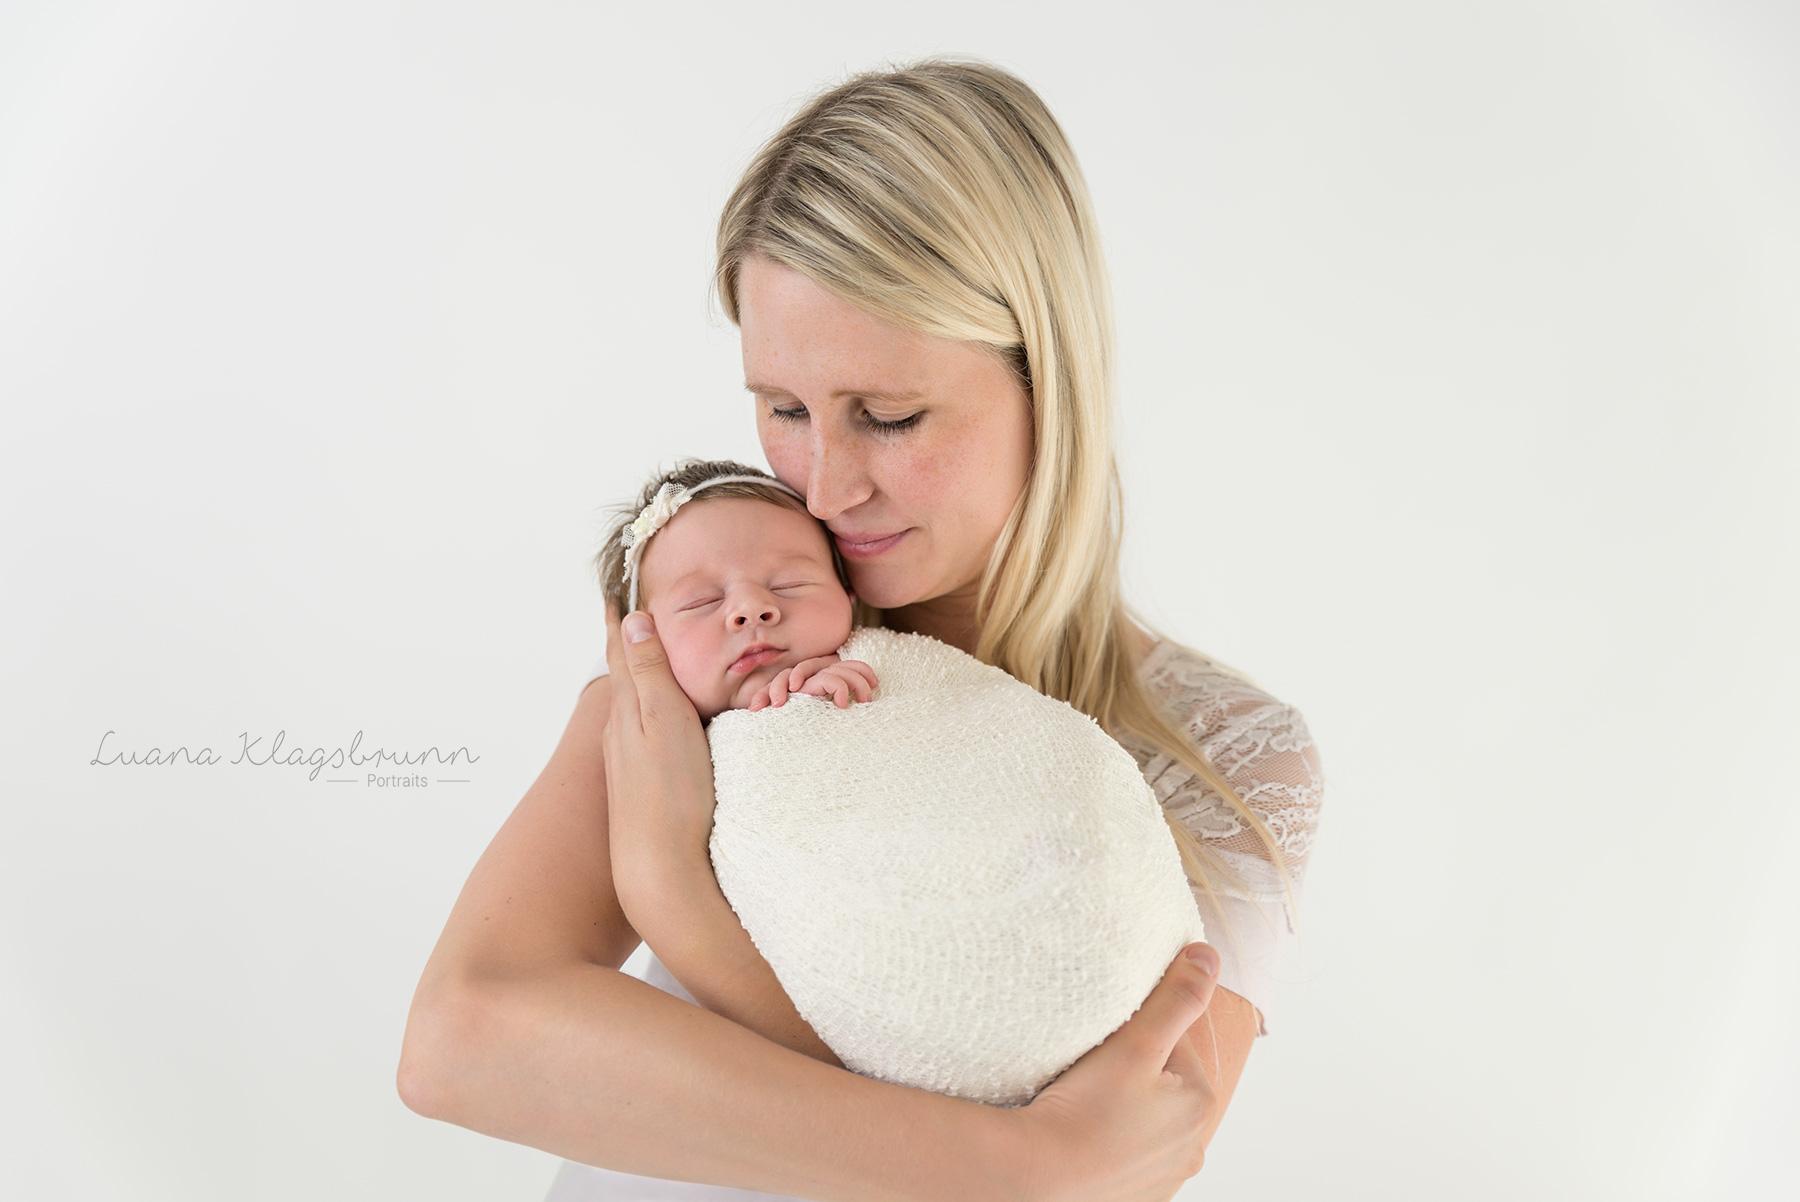 Babyfotografie Karlsruhe Luana Klagsbrunn3.jpg